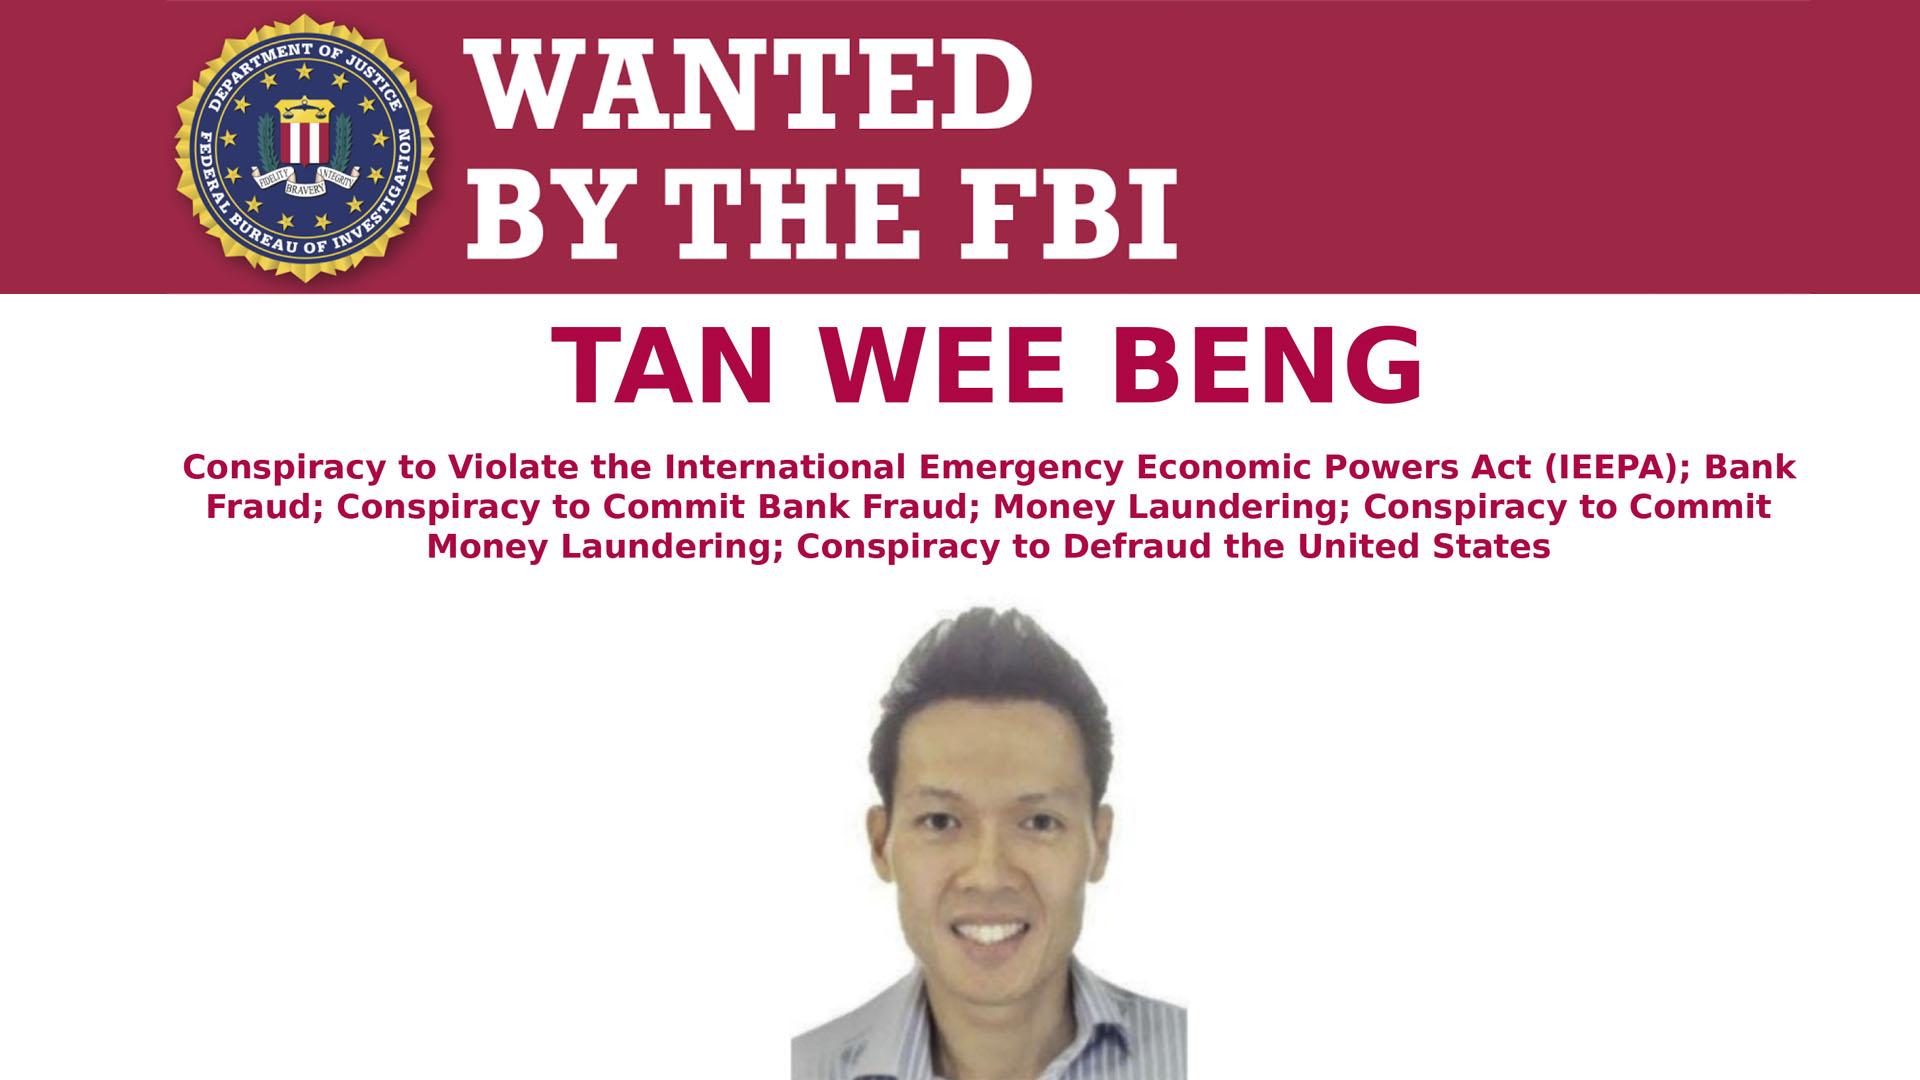 Tan Wee Beng, el empresario de Singapur que está en la mira del FBI